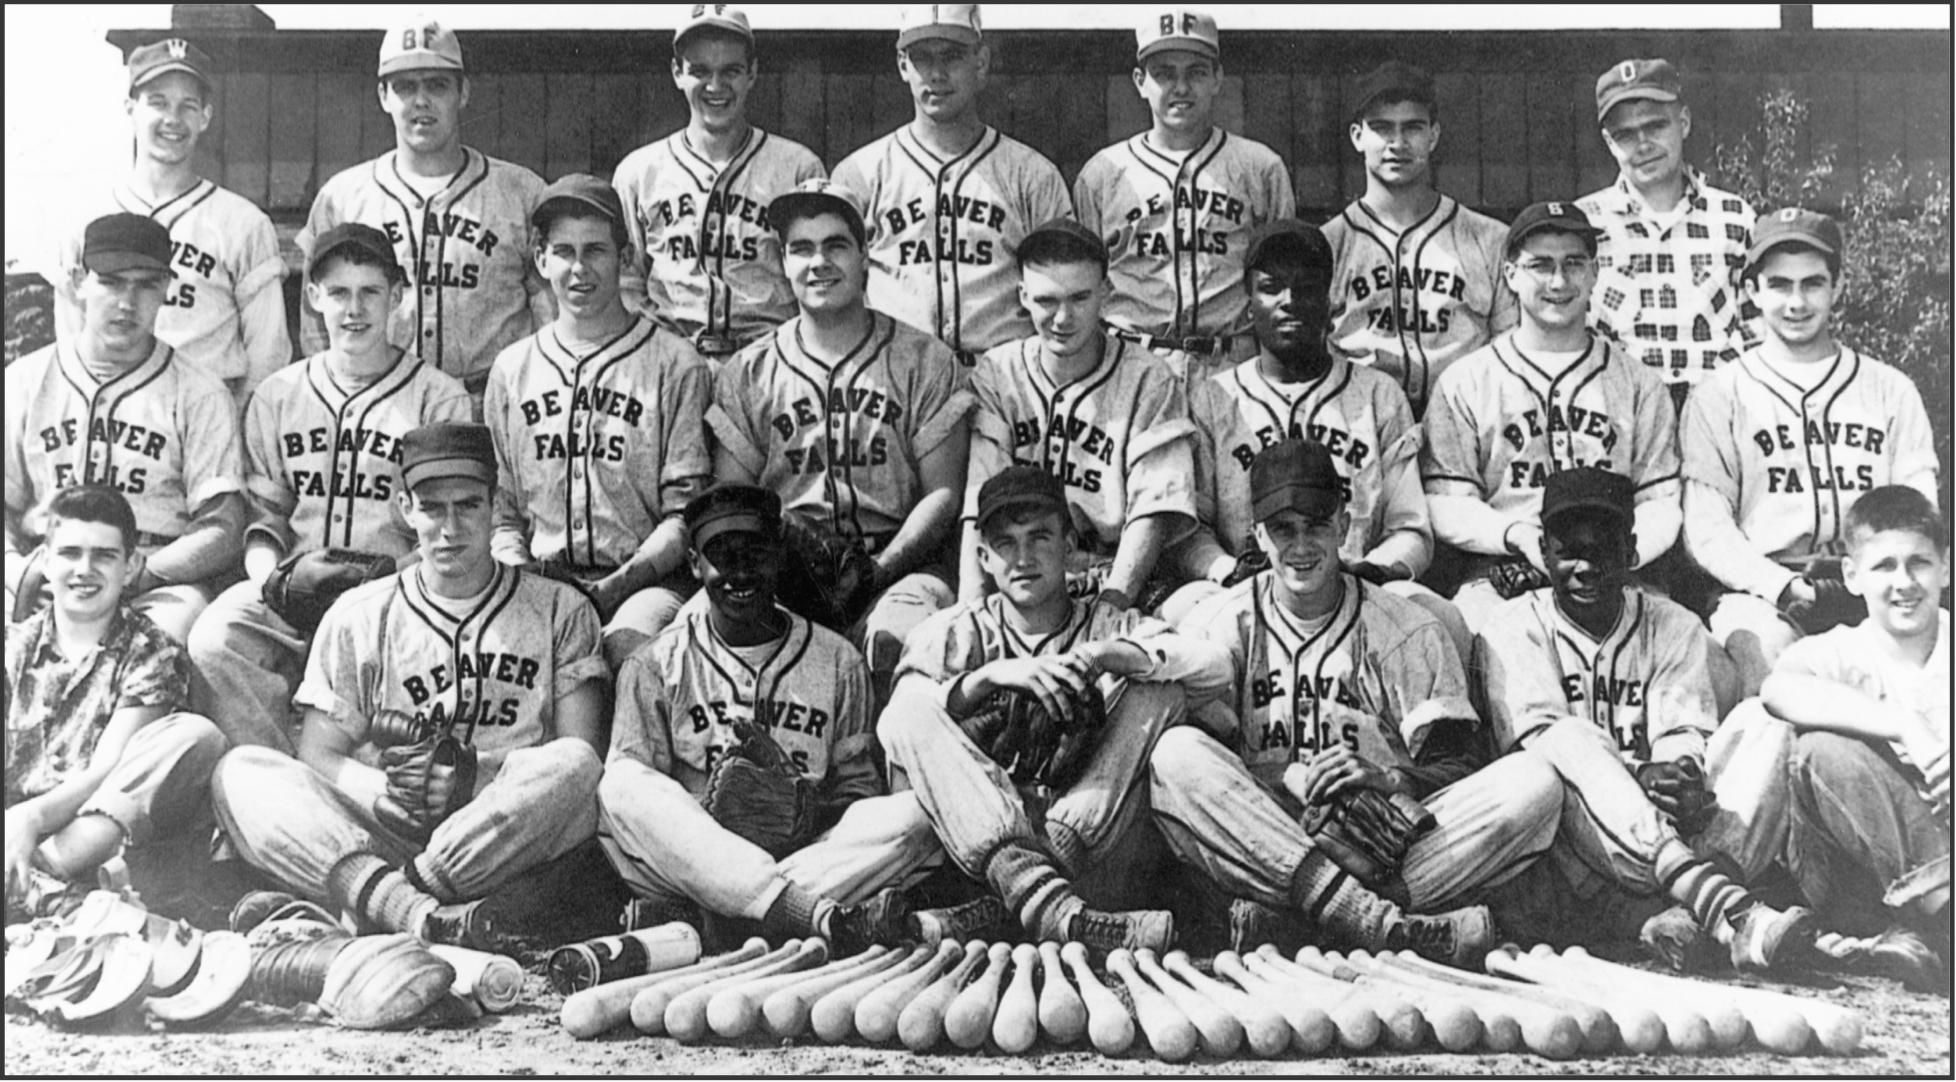 1952 BVHS Baseball Team